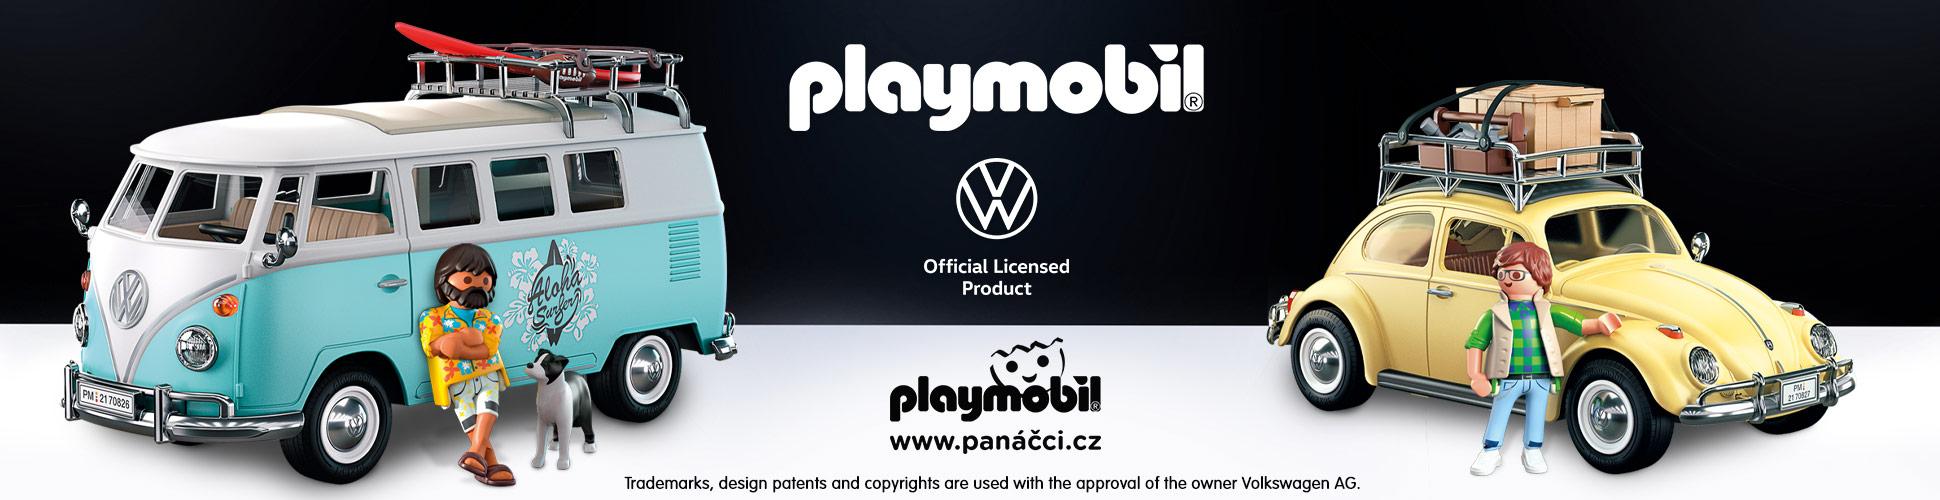 PLAYMOBIL Volkswagen Speciální edice